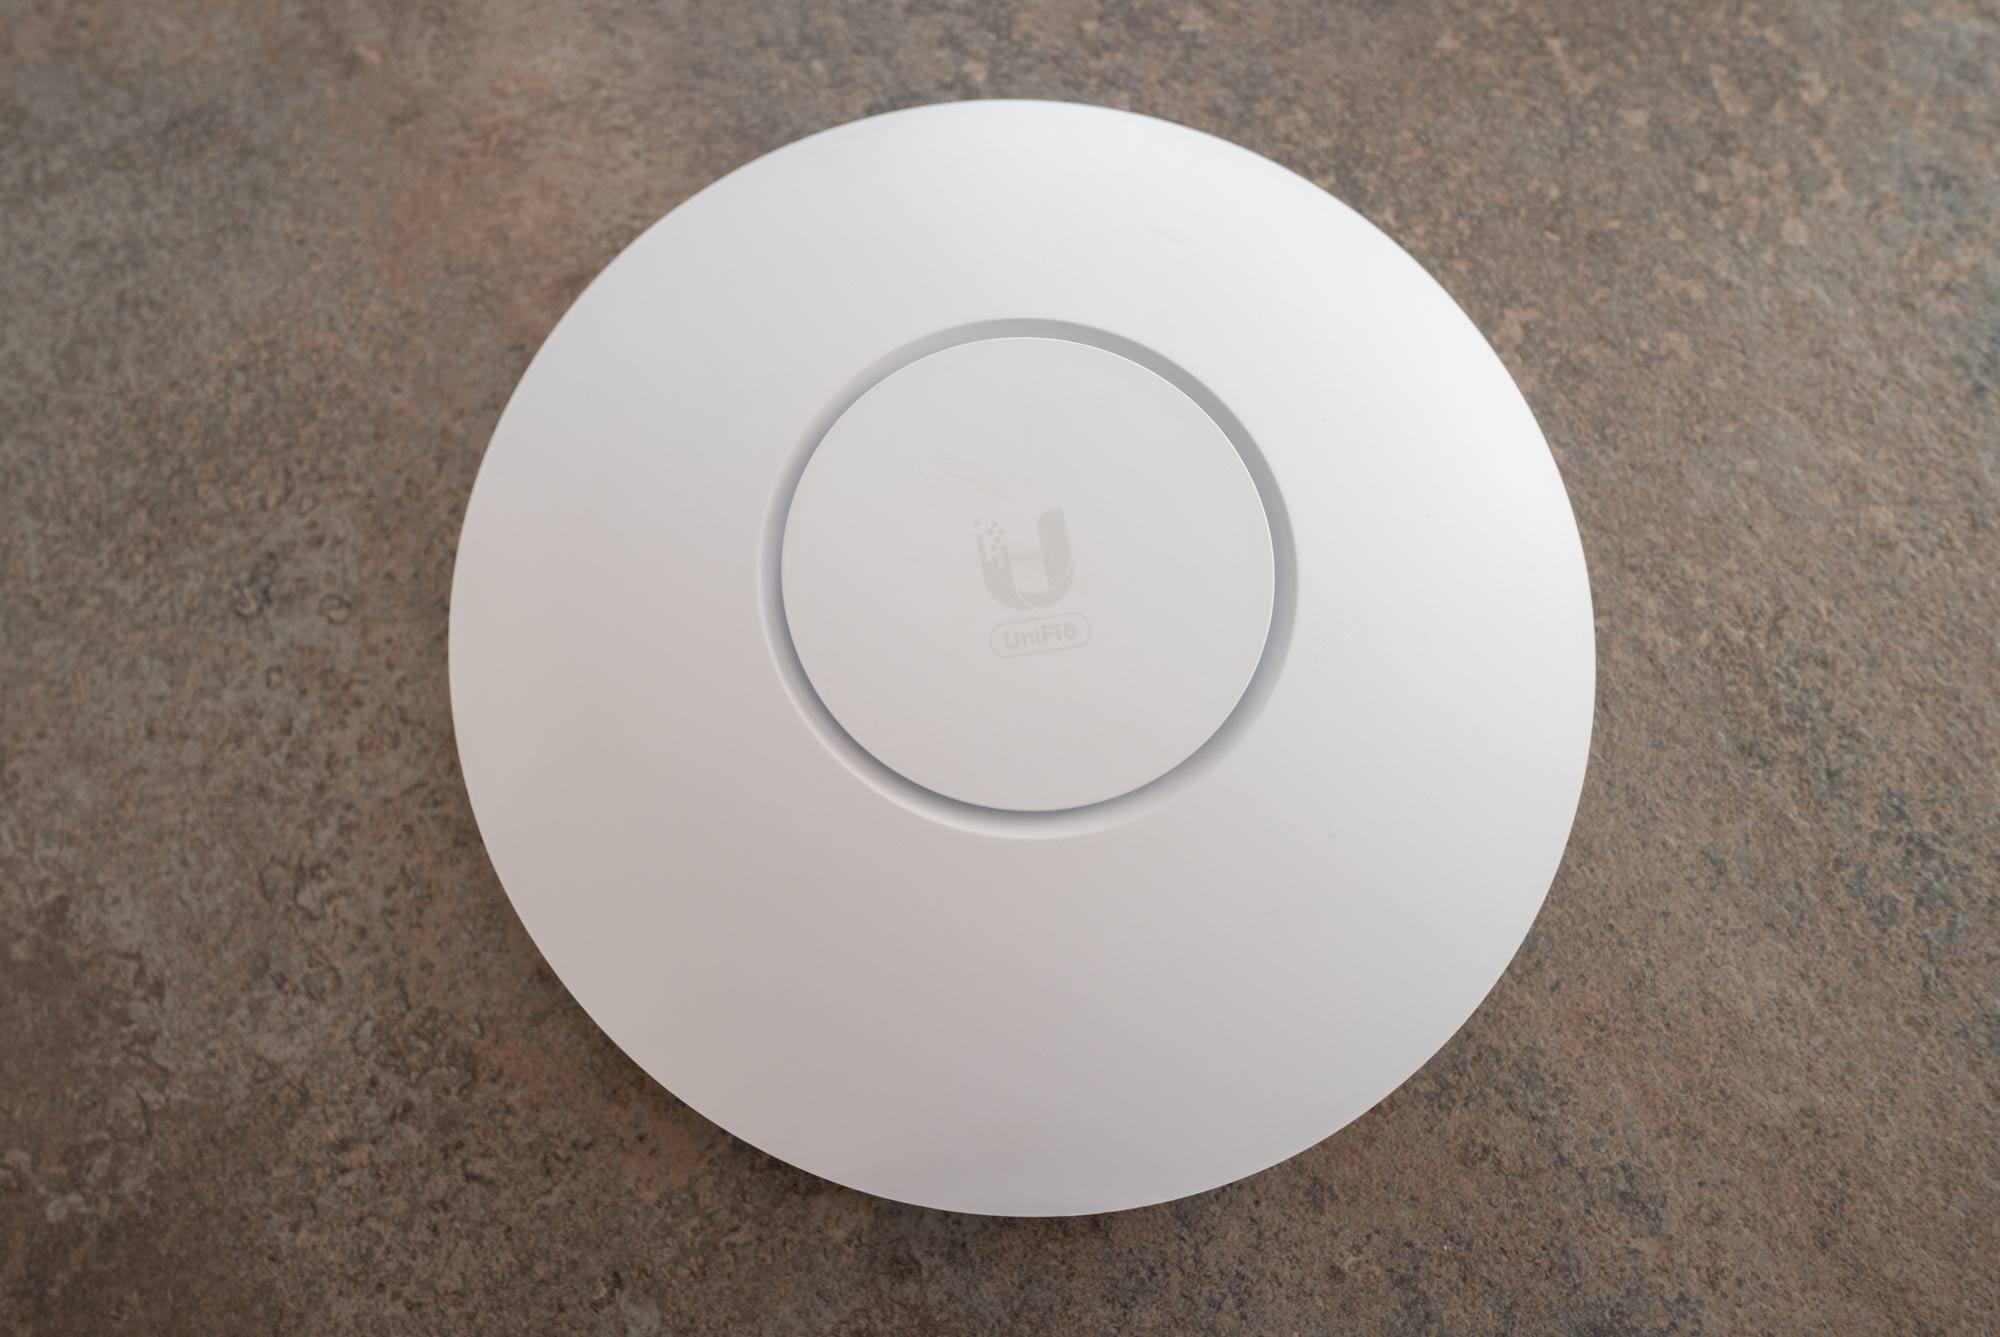 UniFi 6 Long Range Access Point